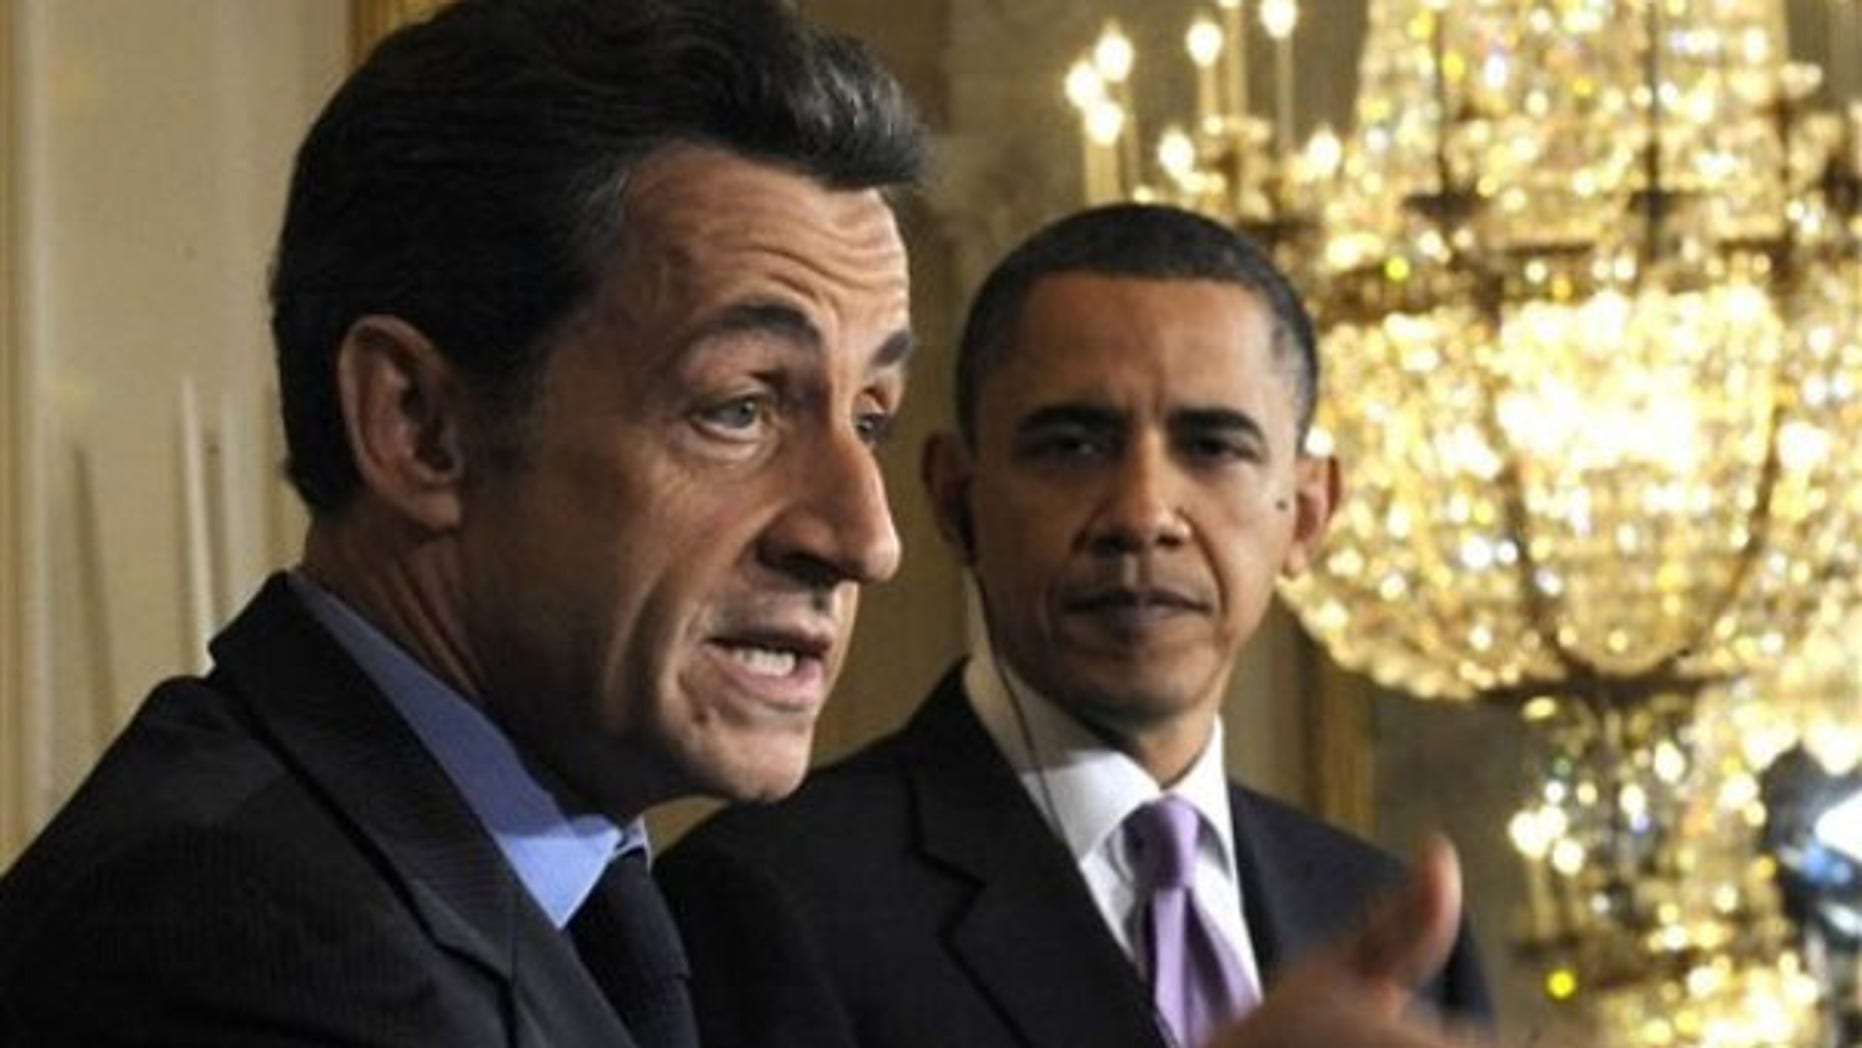 Mar. 30: French President Nicolas Sarkozy speaks as President Obama listens at the White House.